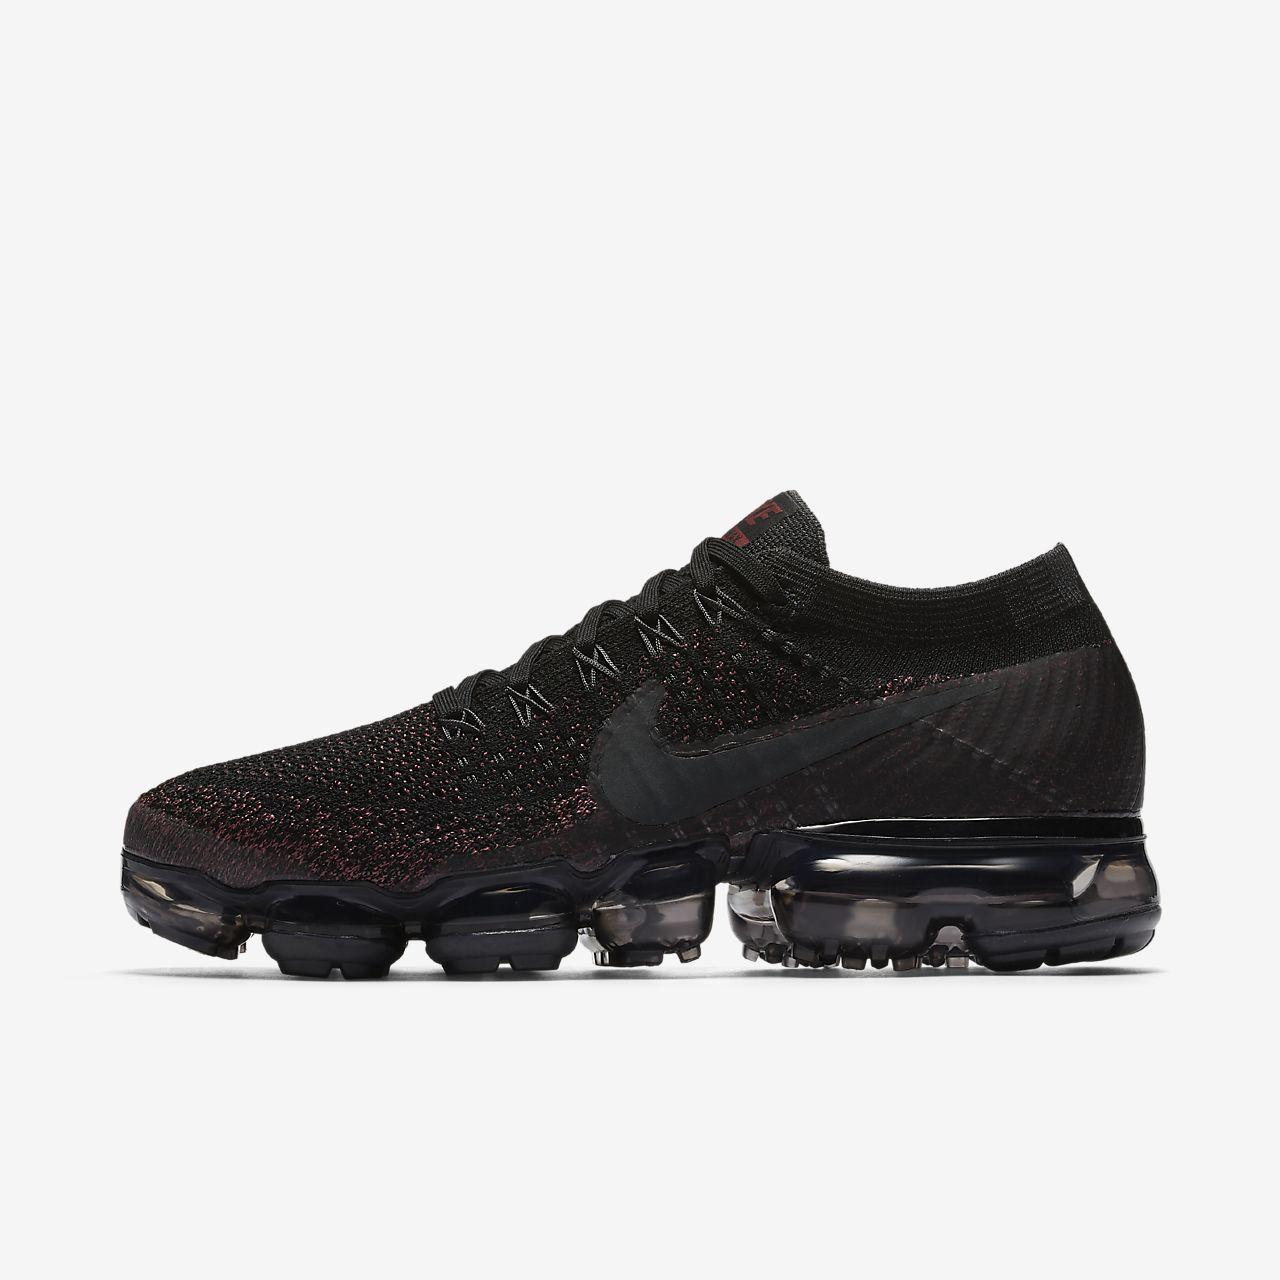 Nike Womens Air Vapormax Flyknit Black Grey White Shoes